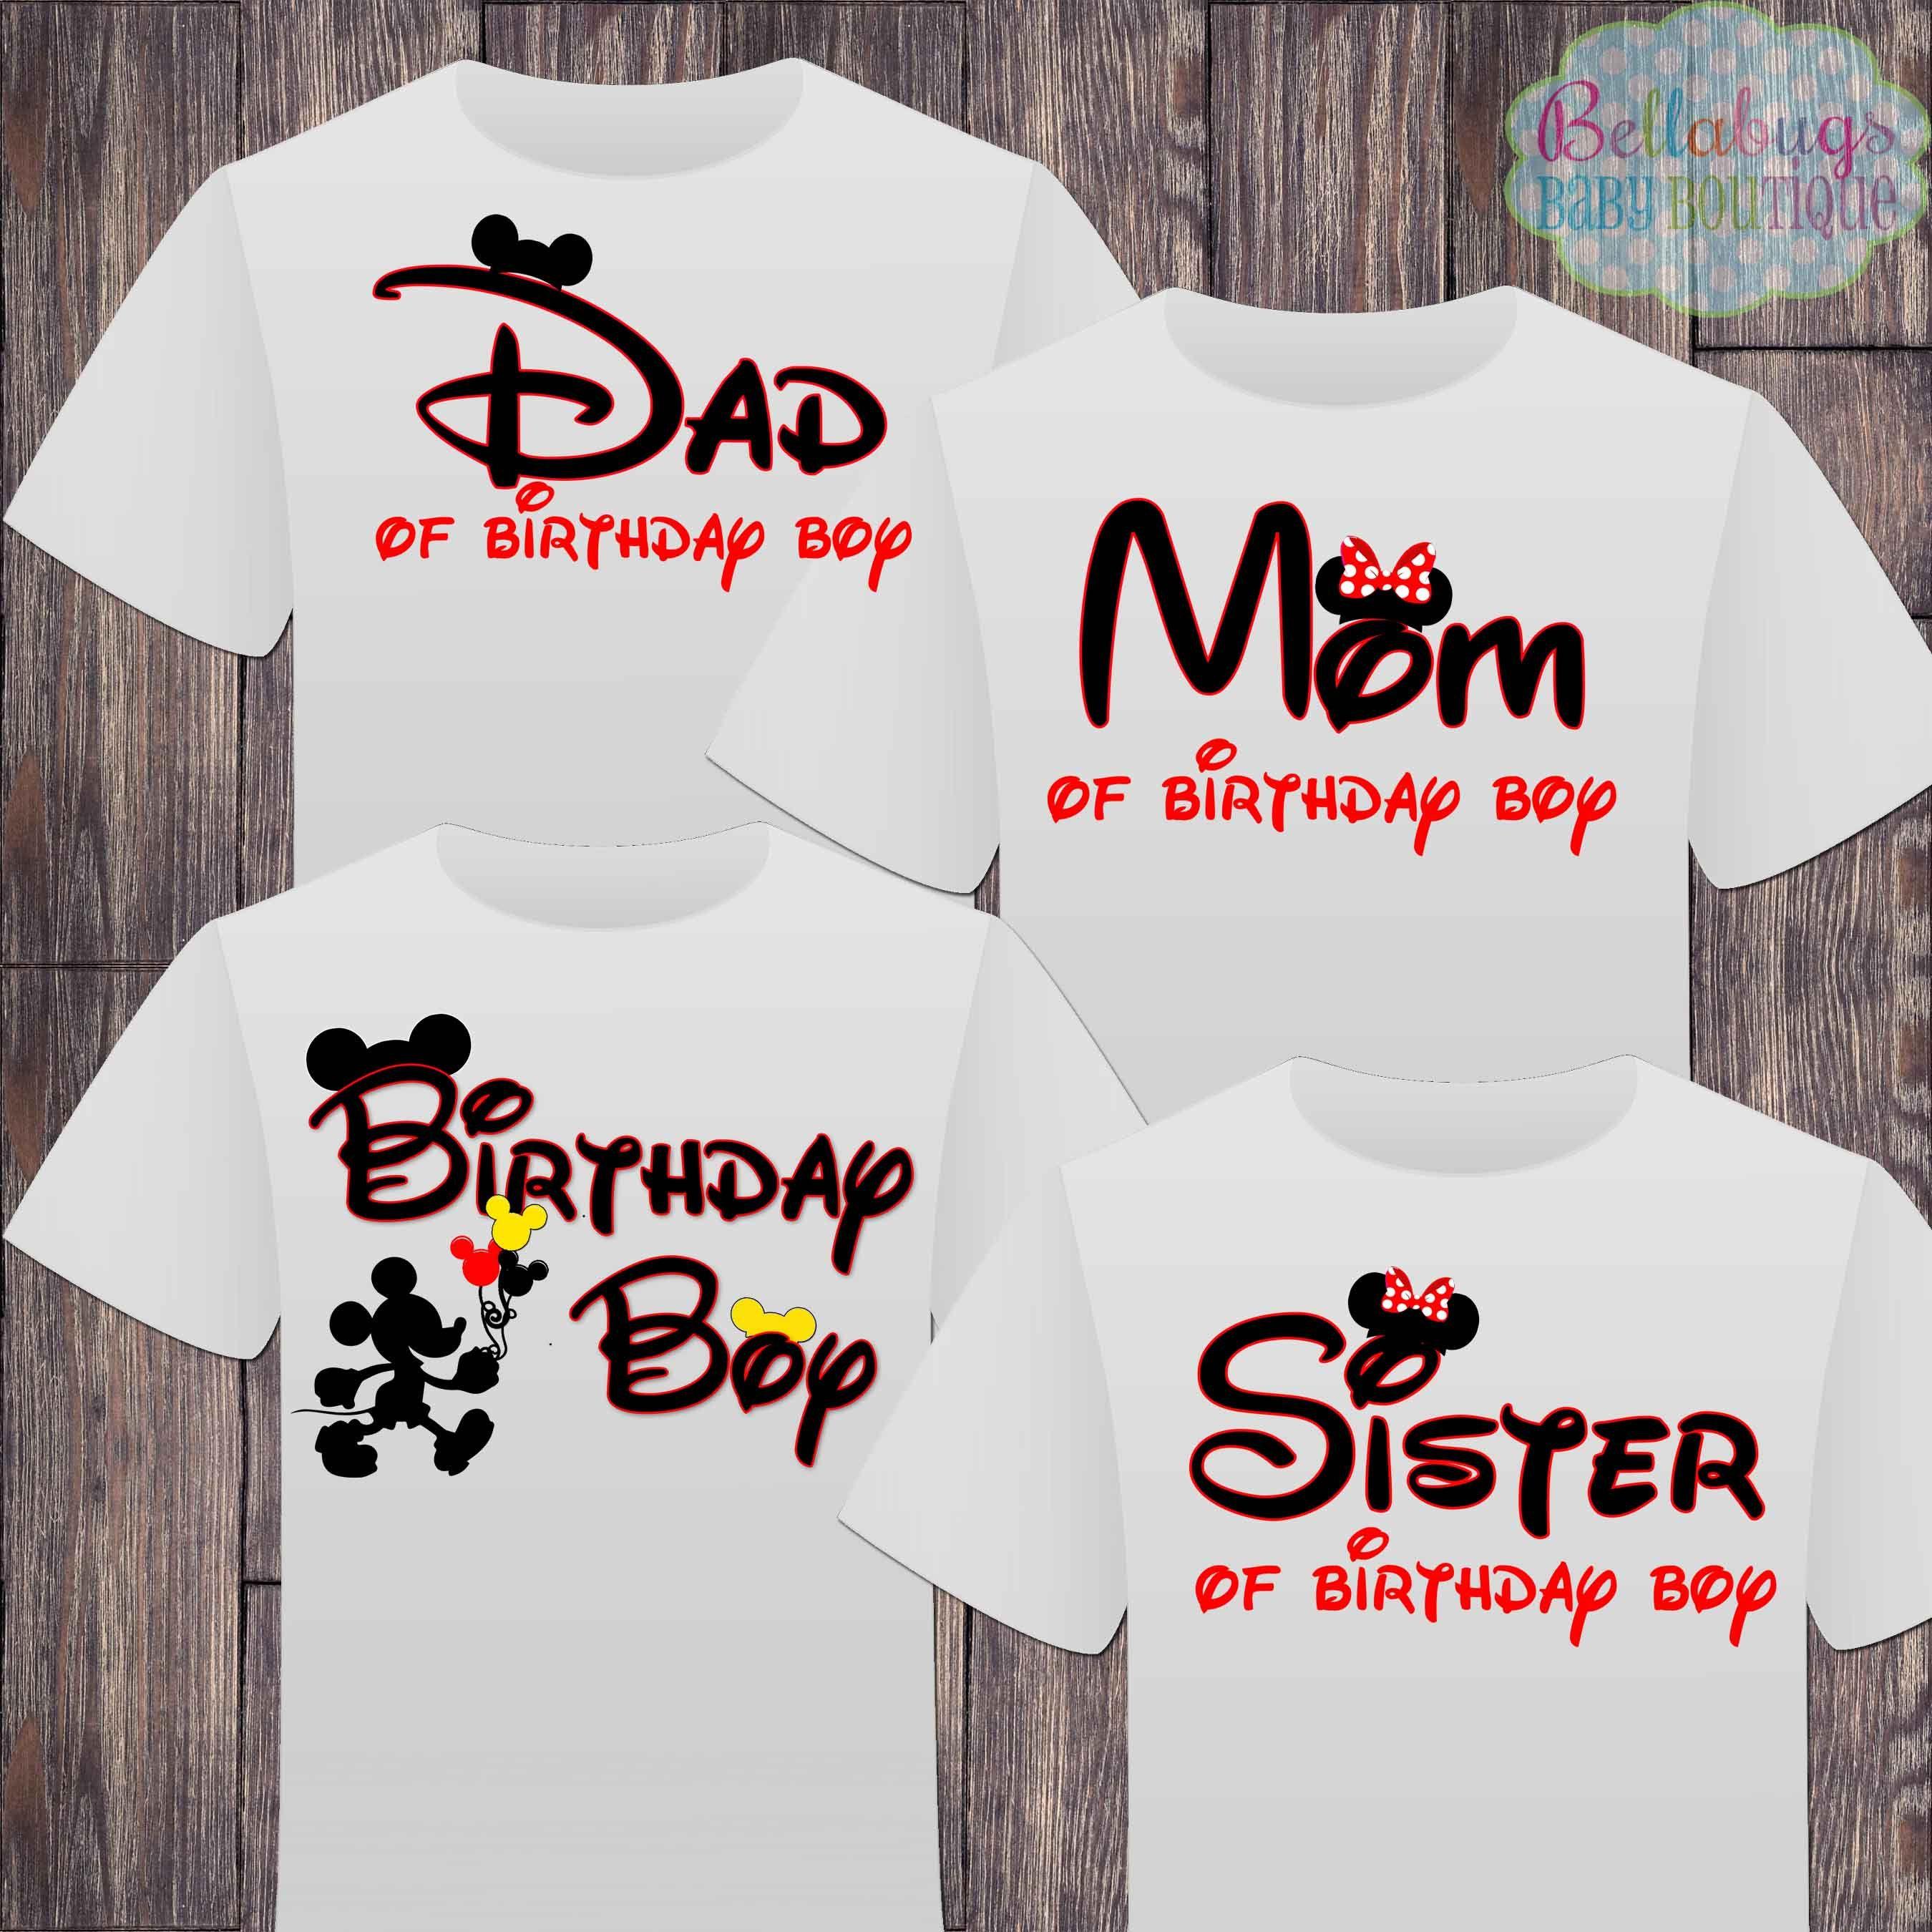 Matching disney family birthday boy tshirts mickey mouse